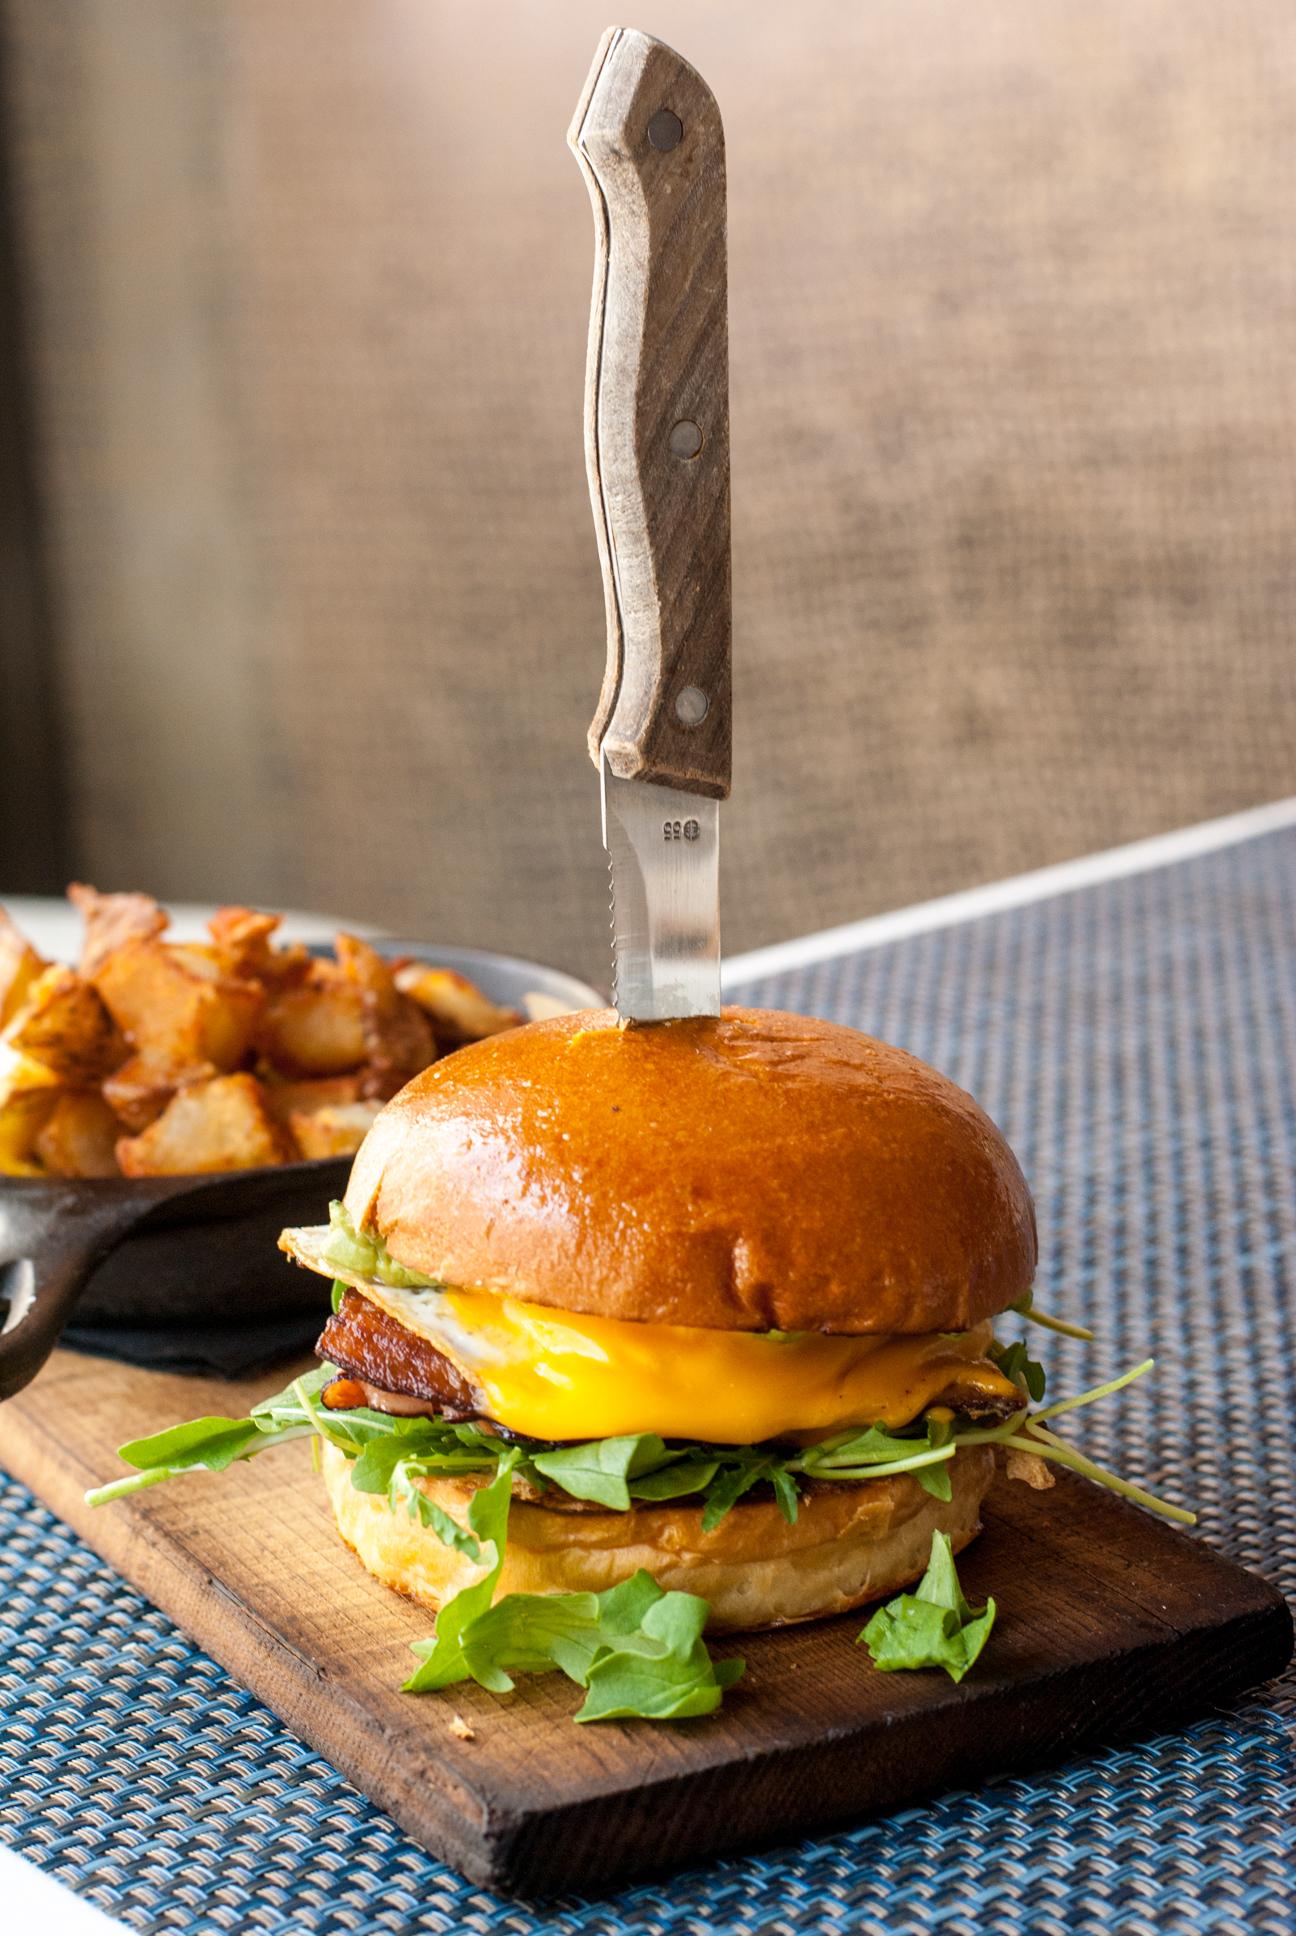 Three Little Piggies breakfast sandwich at Beachside Restaurant & Bar, Marina del Rey, CA